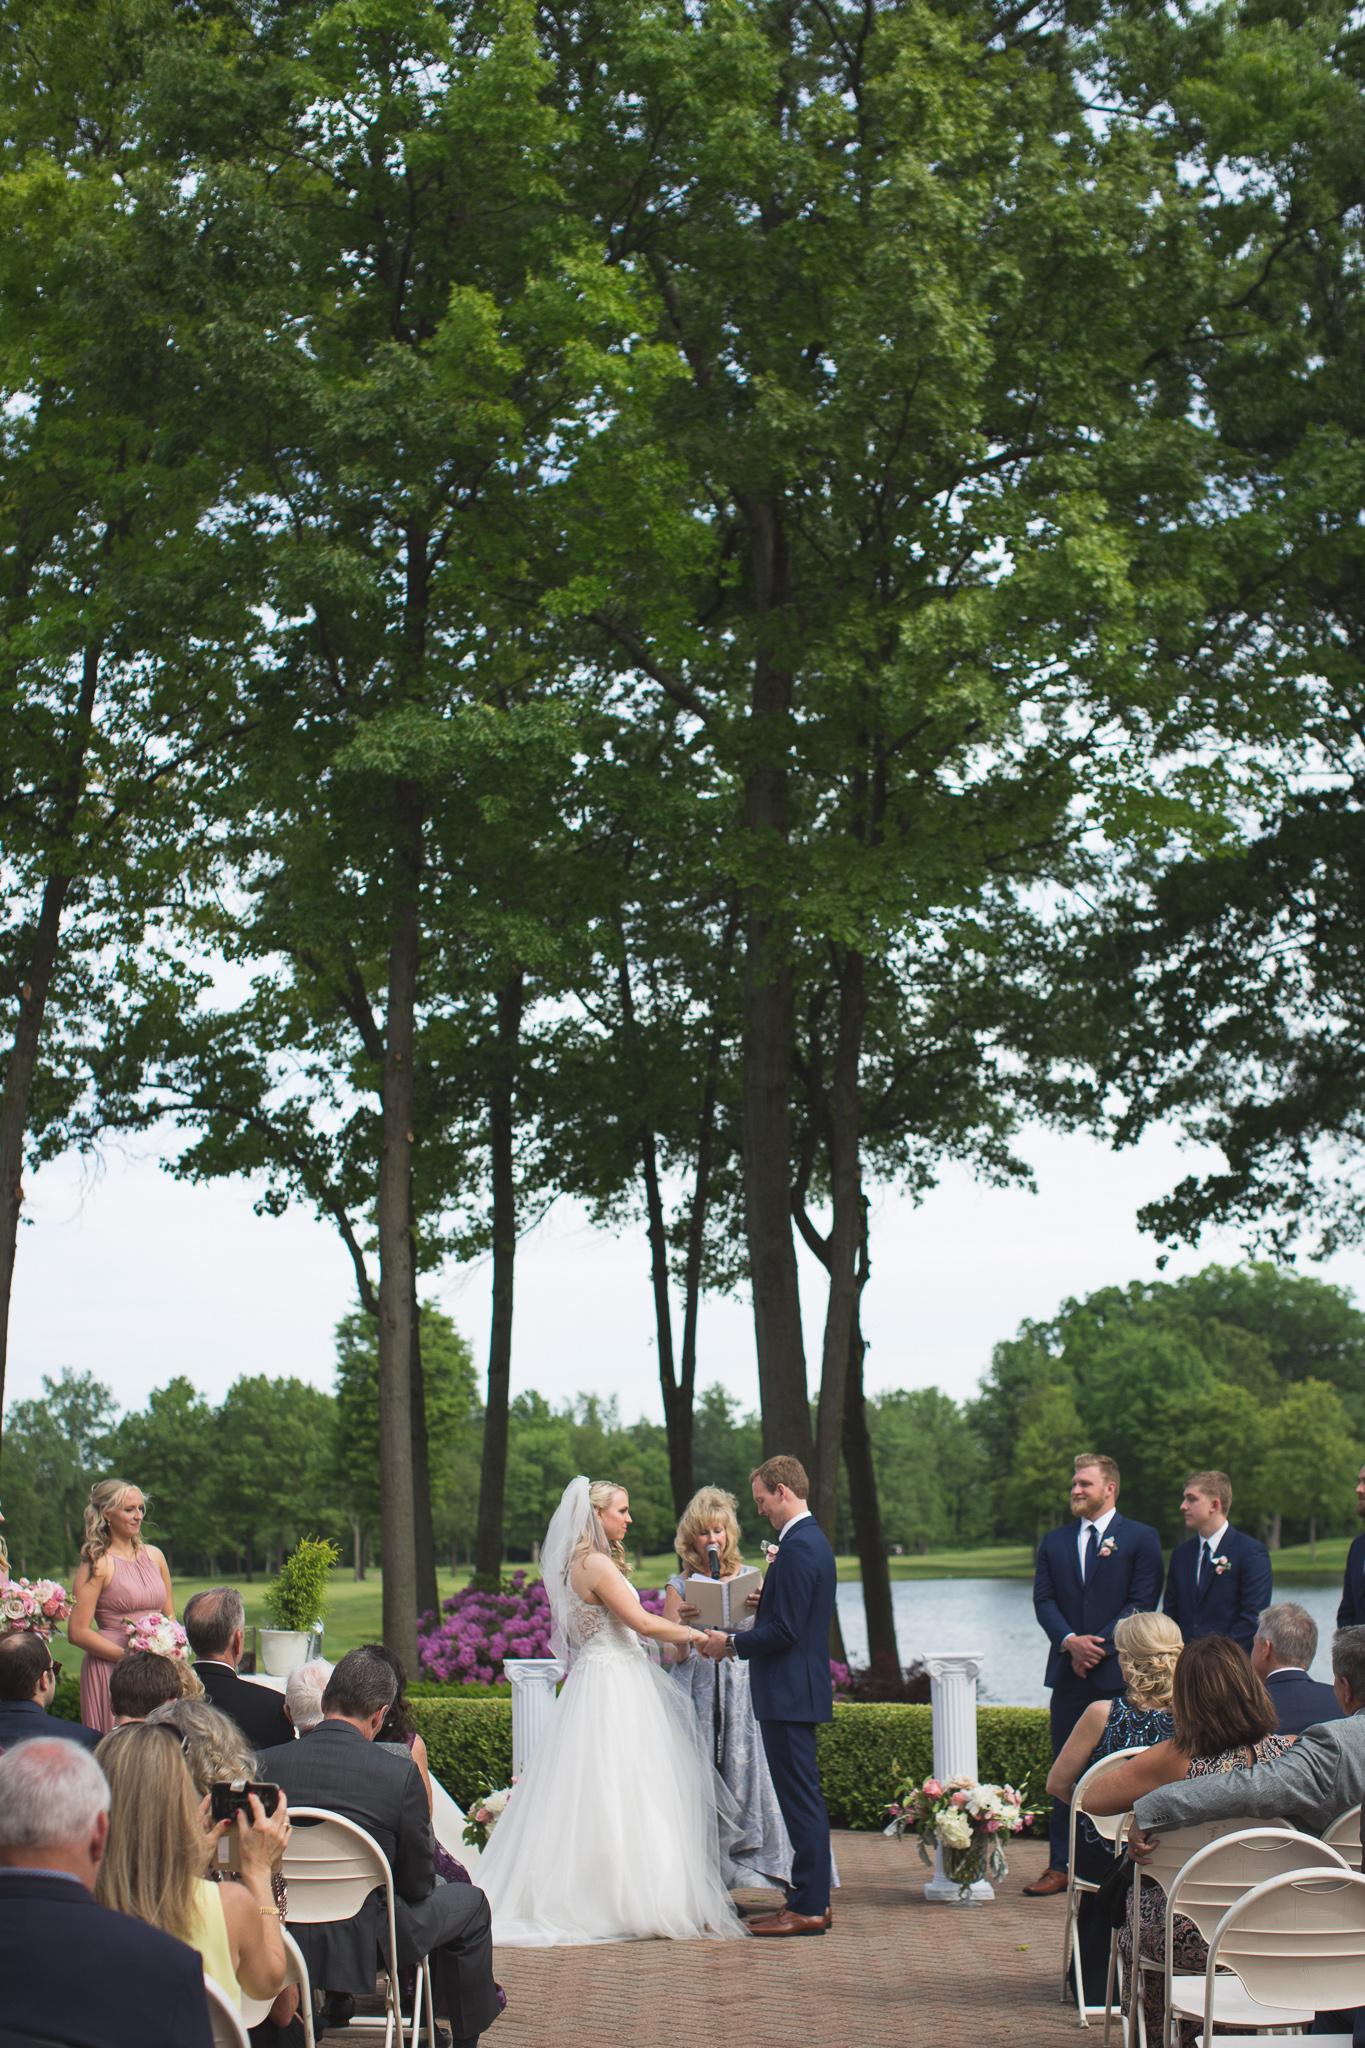 093-best-detroit-michigan-outdoor-wedding-photographer.jpg